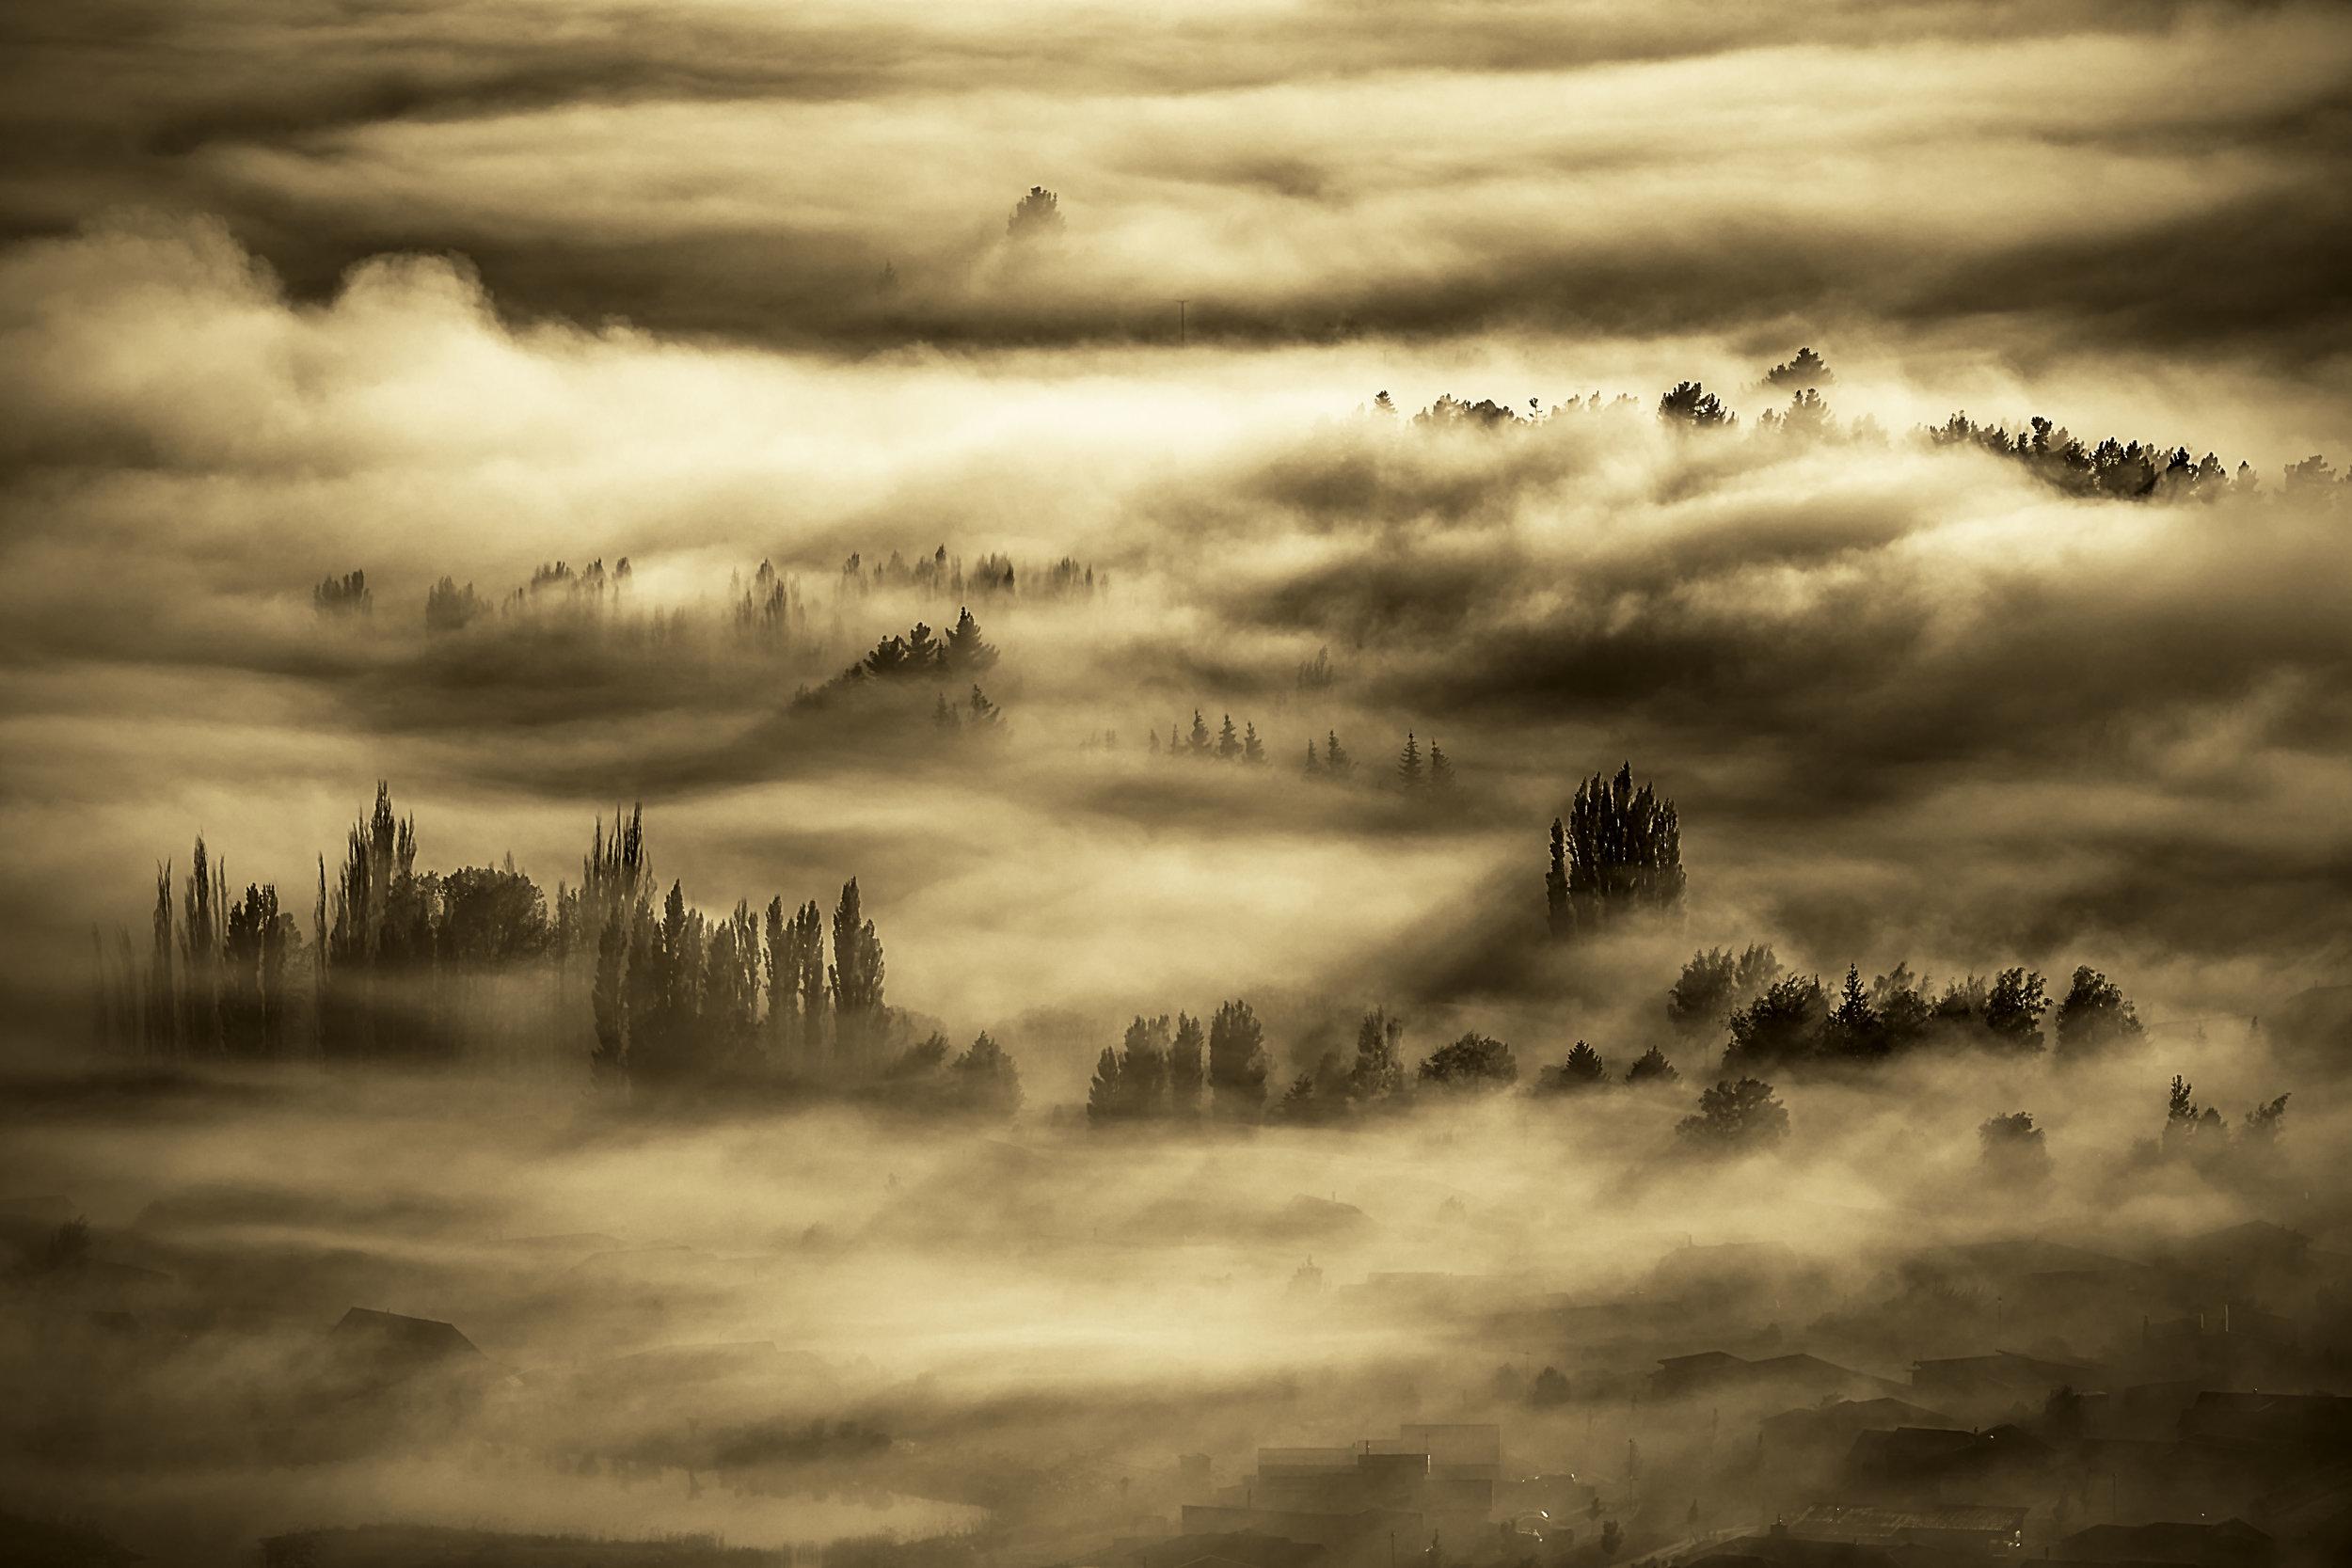 Landscape category winner, Andy Thompson, Hawea Inversion